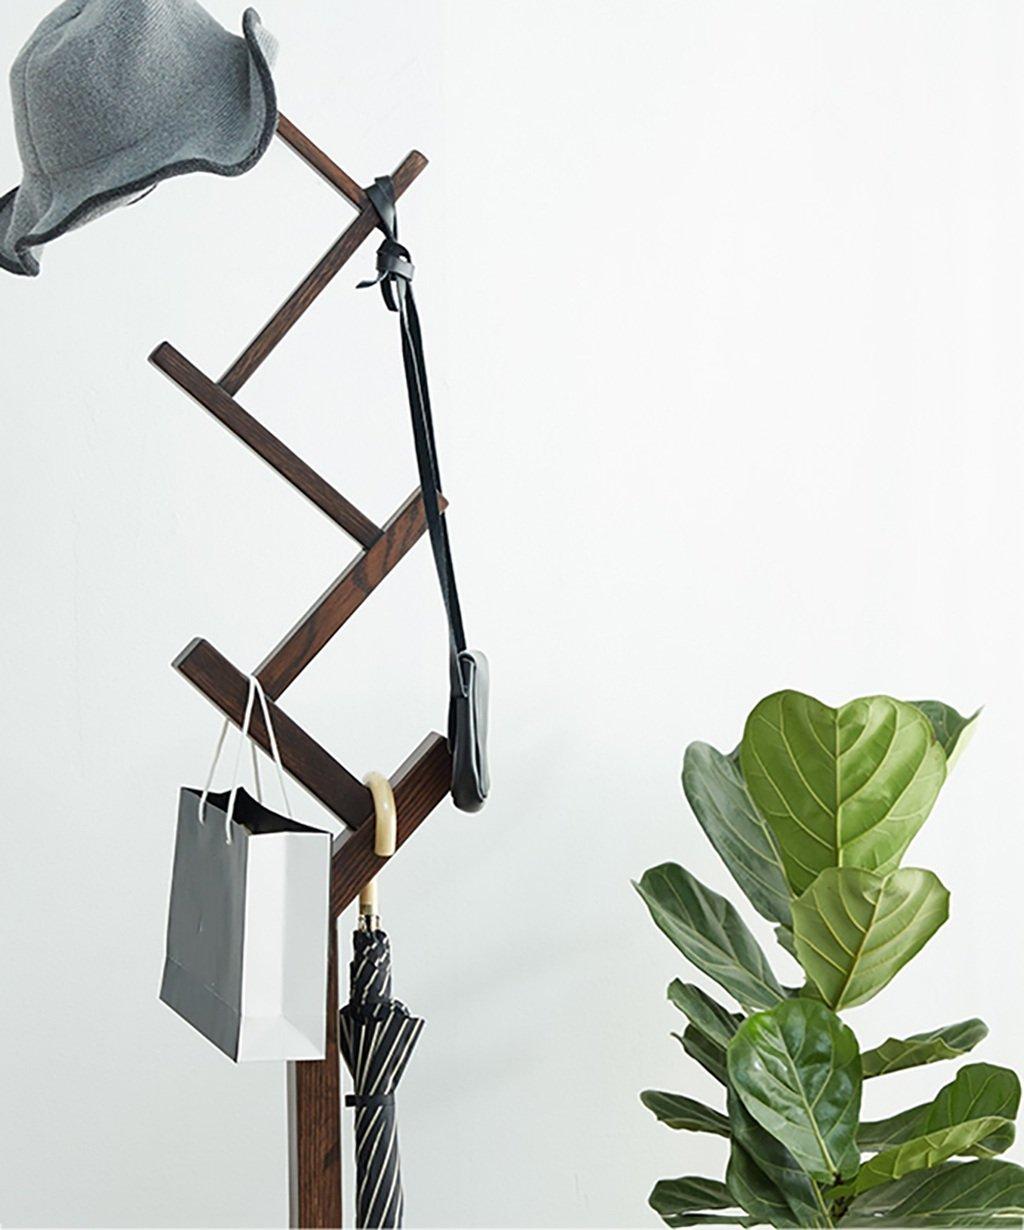 Amazon.com: LIANGJUN - Perchero de pie (6 posiciones, roble ...